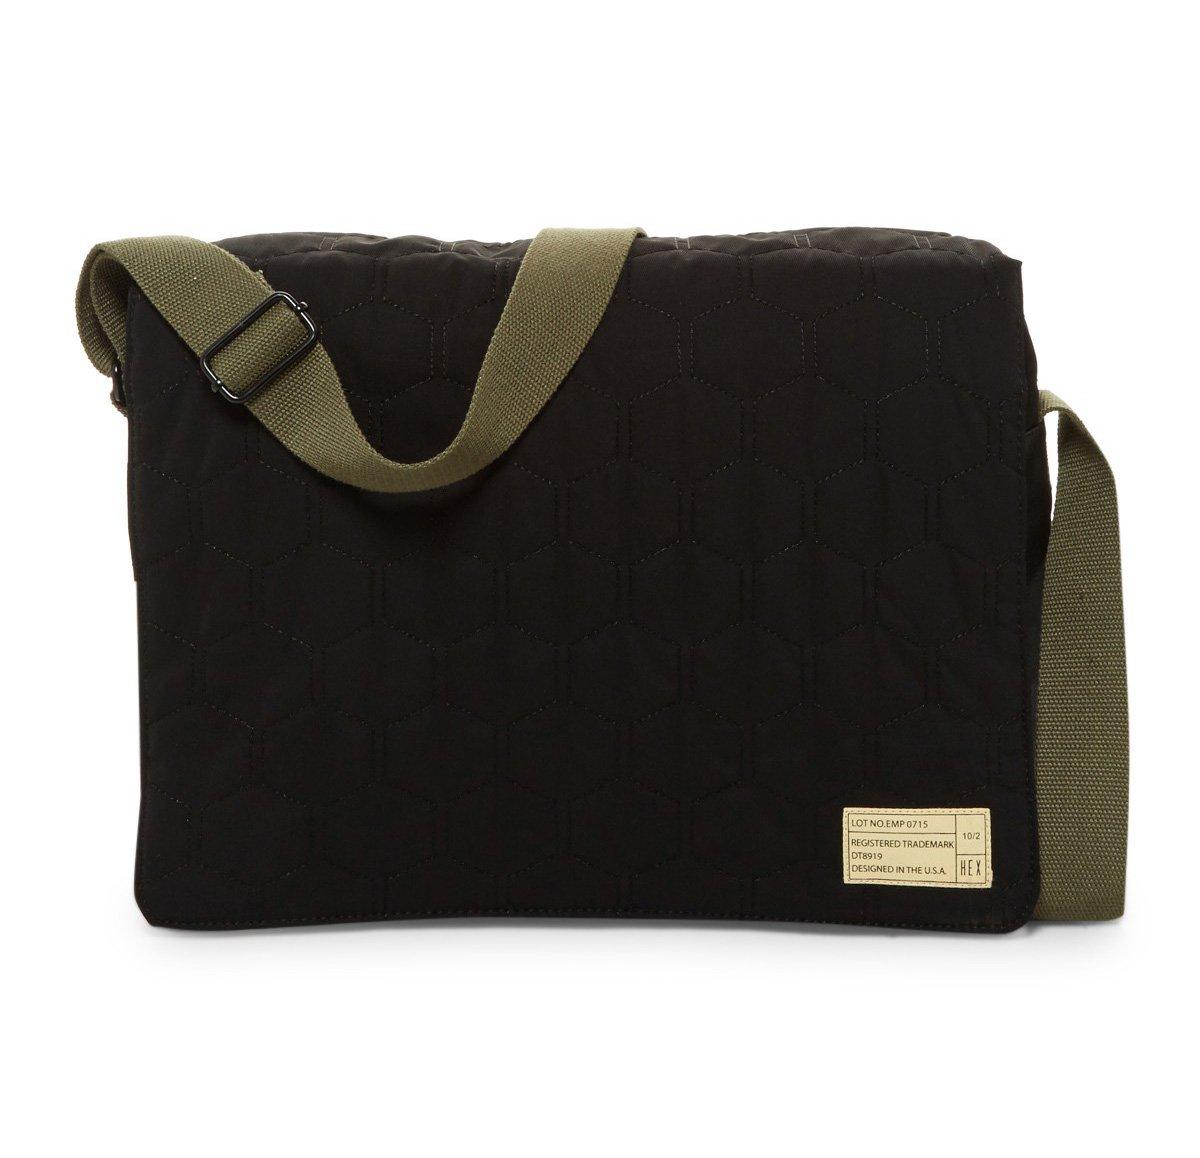 HEX Empire Messenger Bag for 13'' MacBook Pro & Laptops, Black Quilt